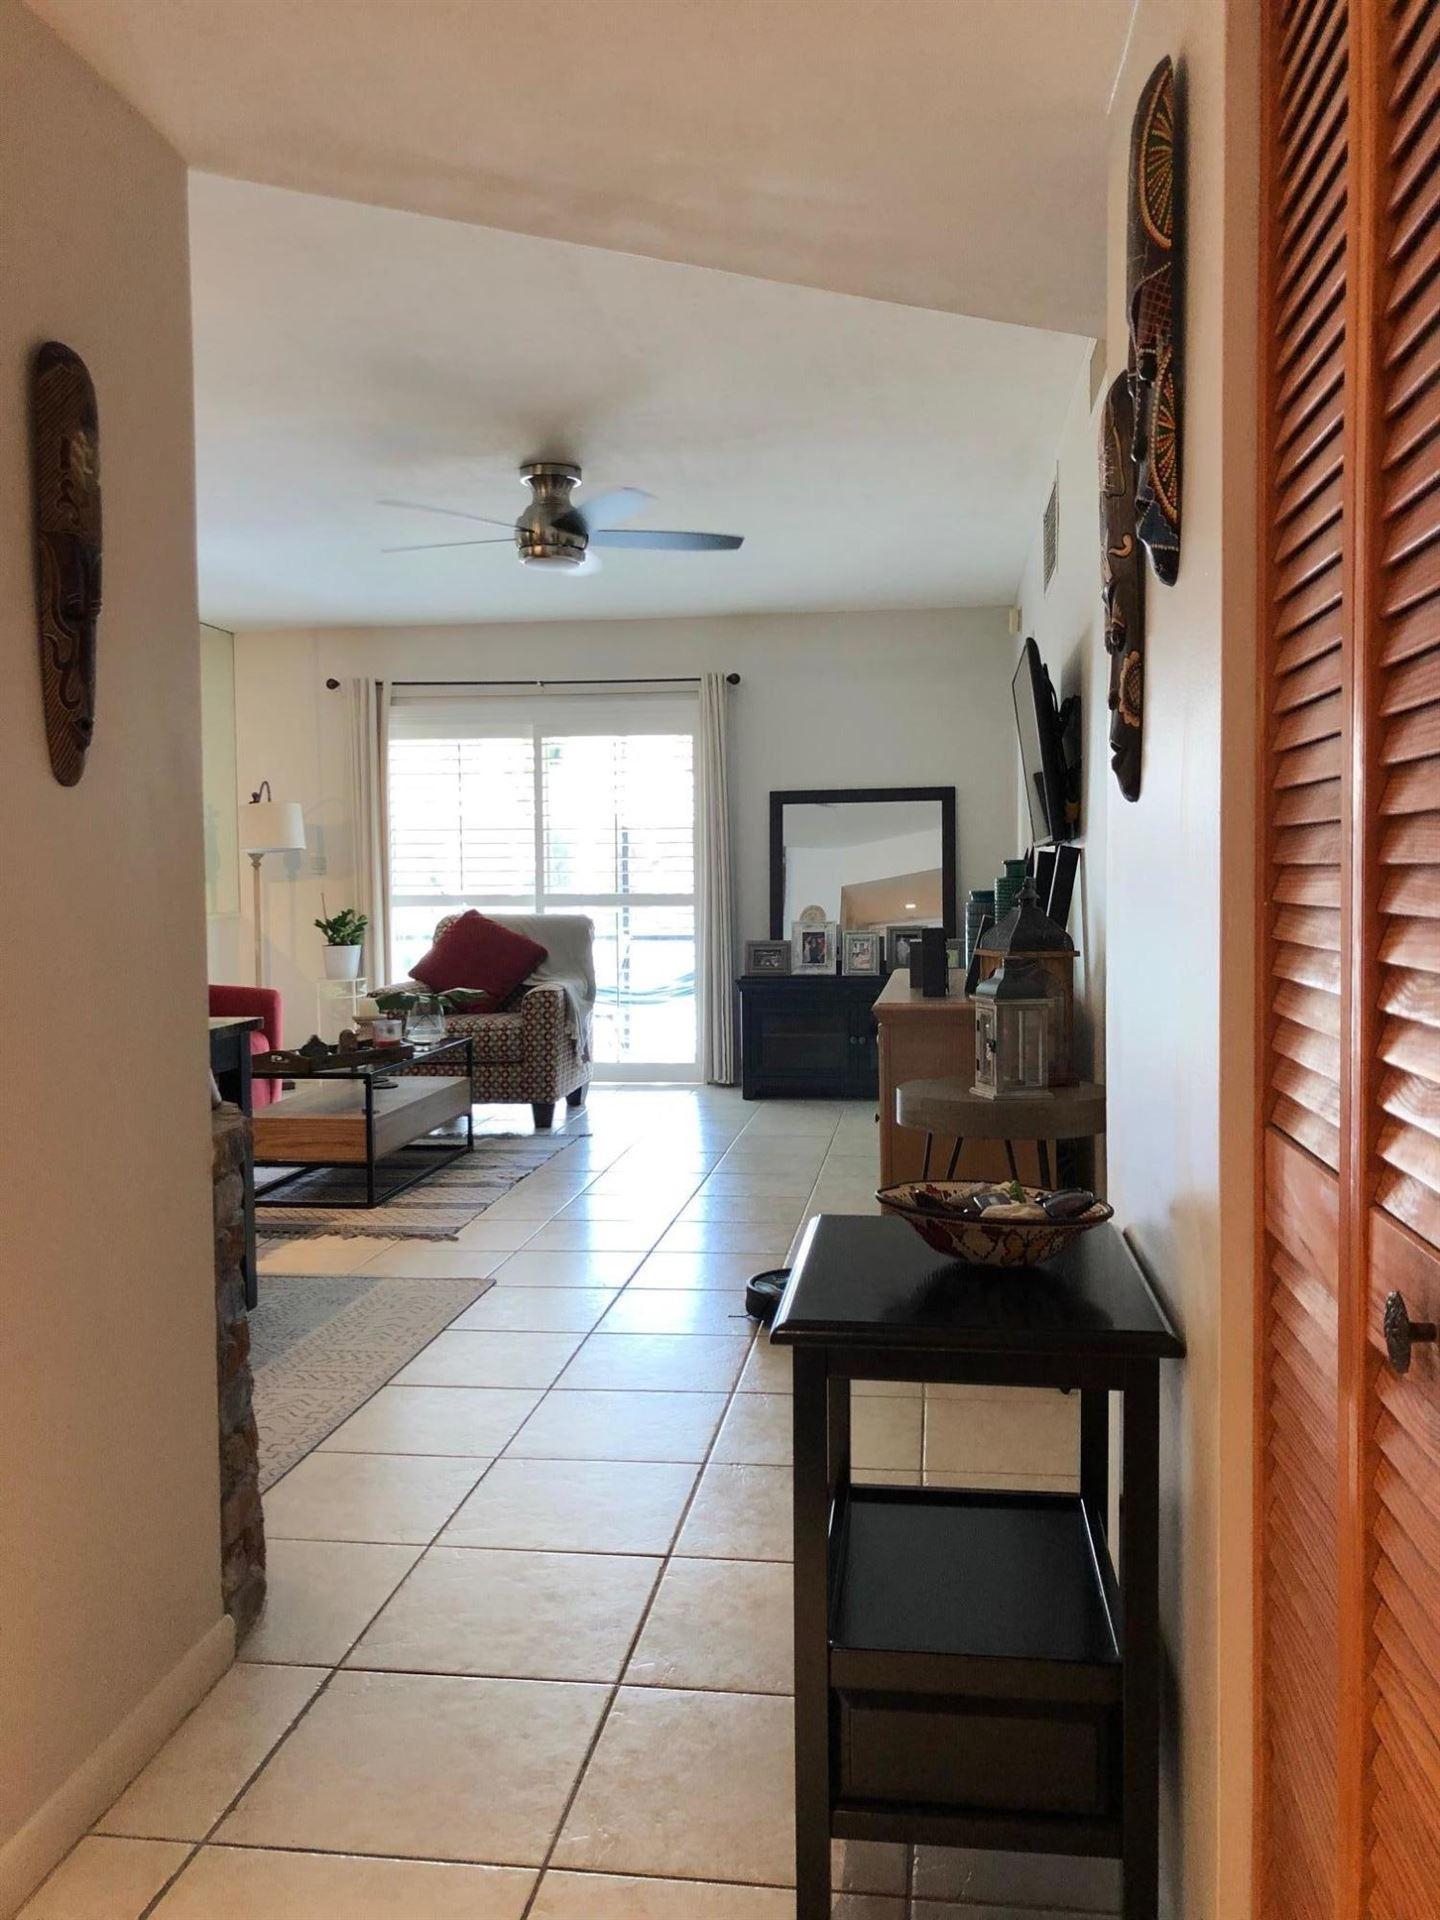 257 S Cypress Road Road #409, Pompano Beach, FL 33060 - #: RX-10630098